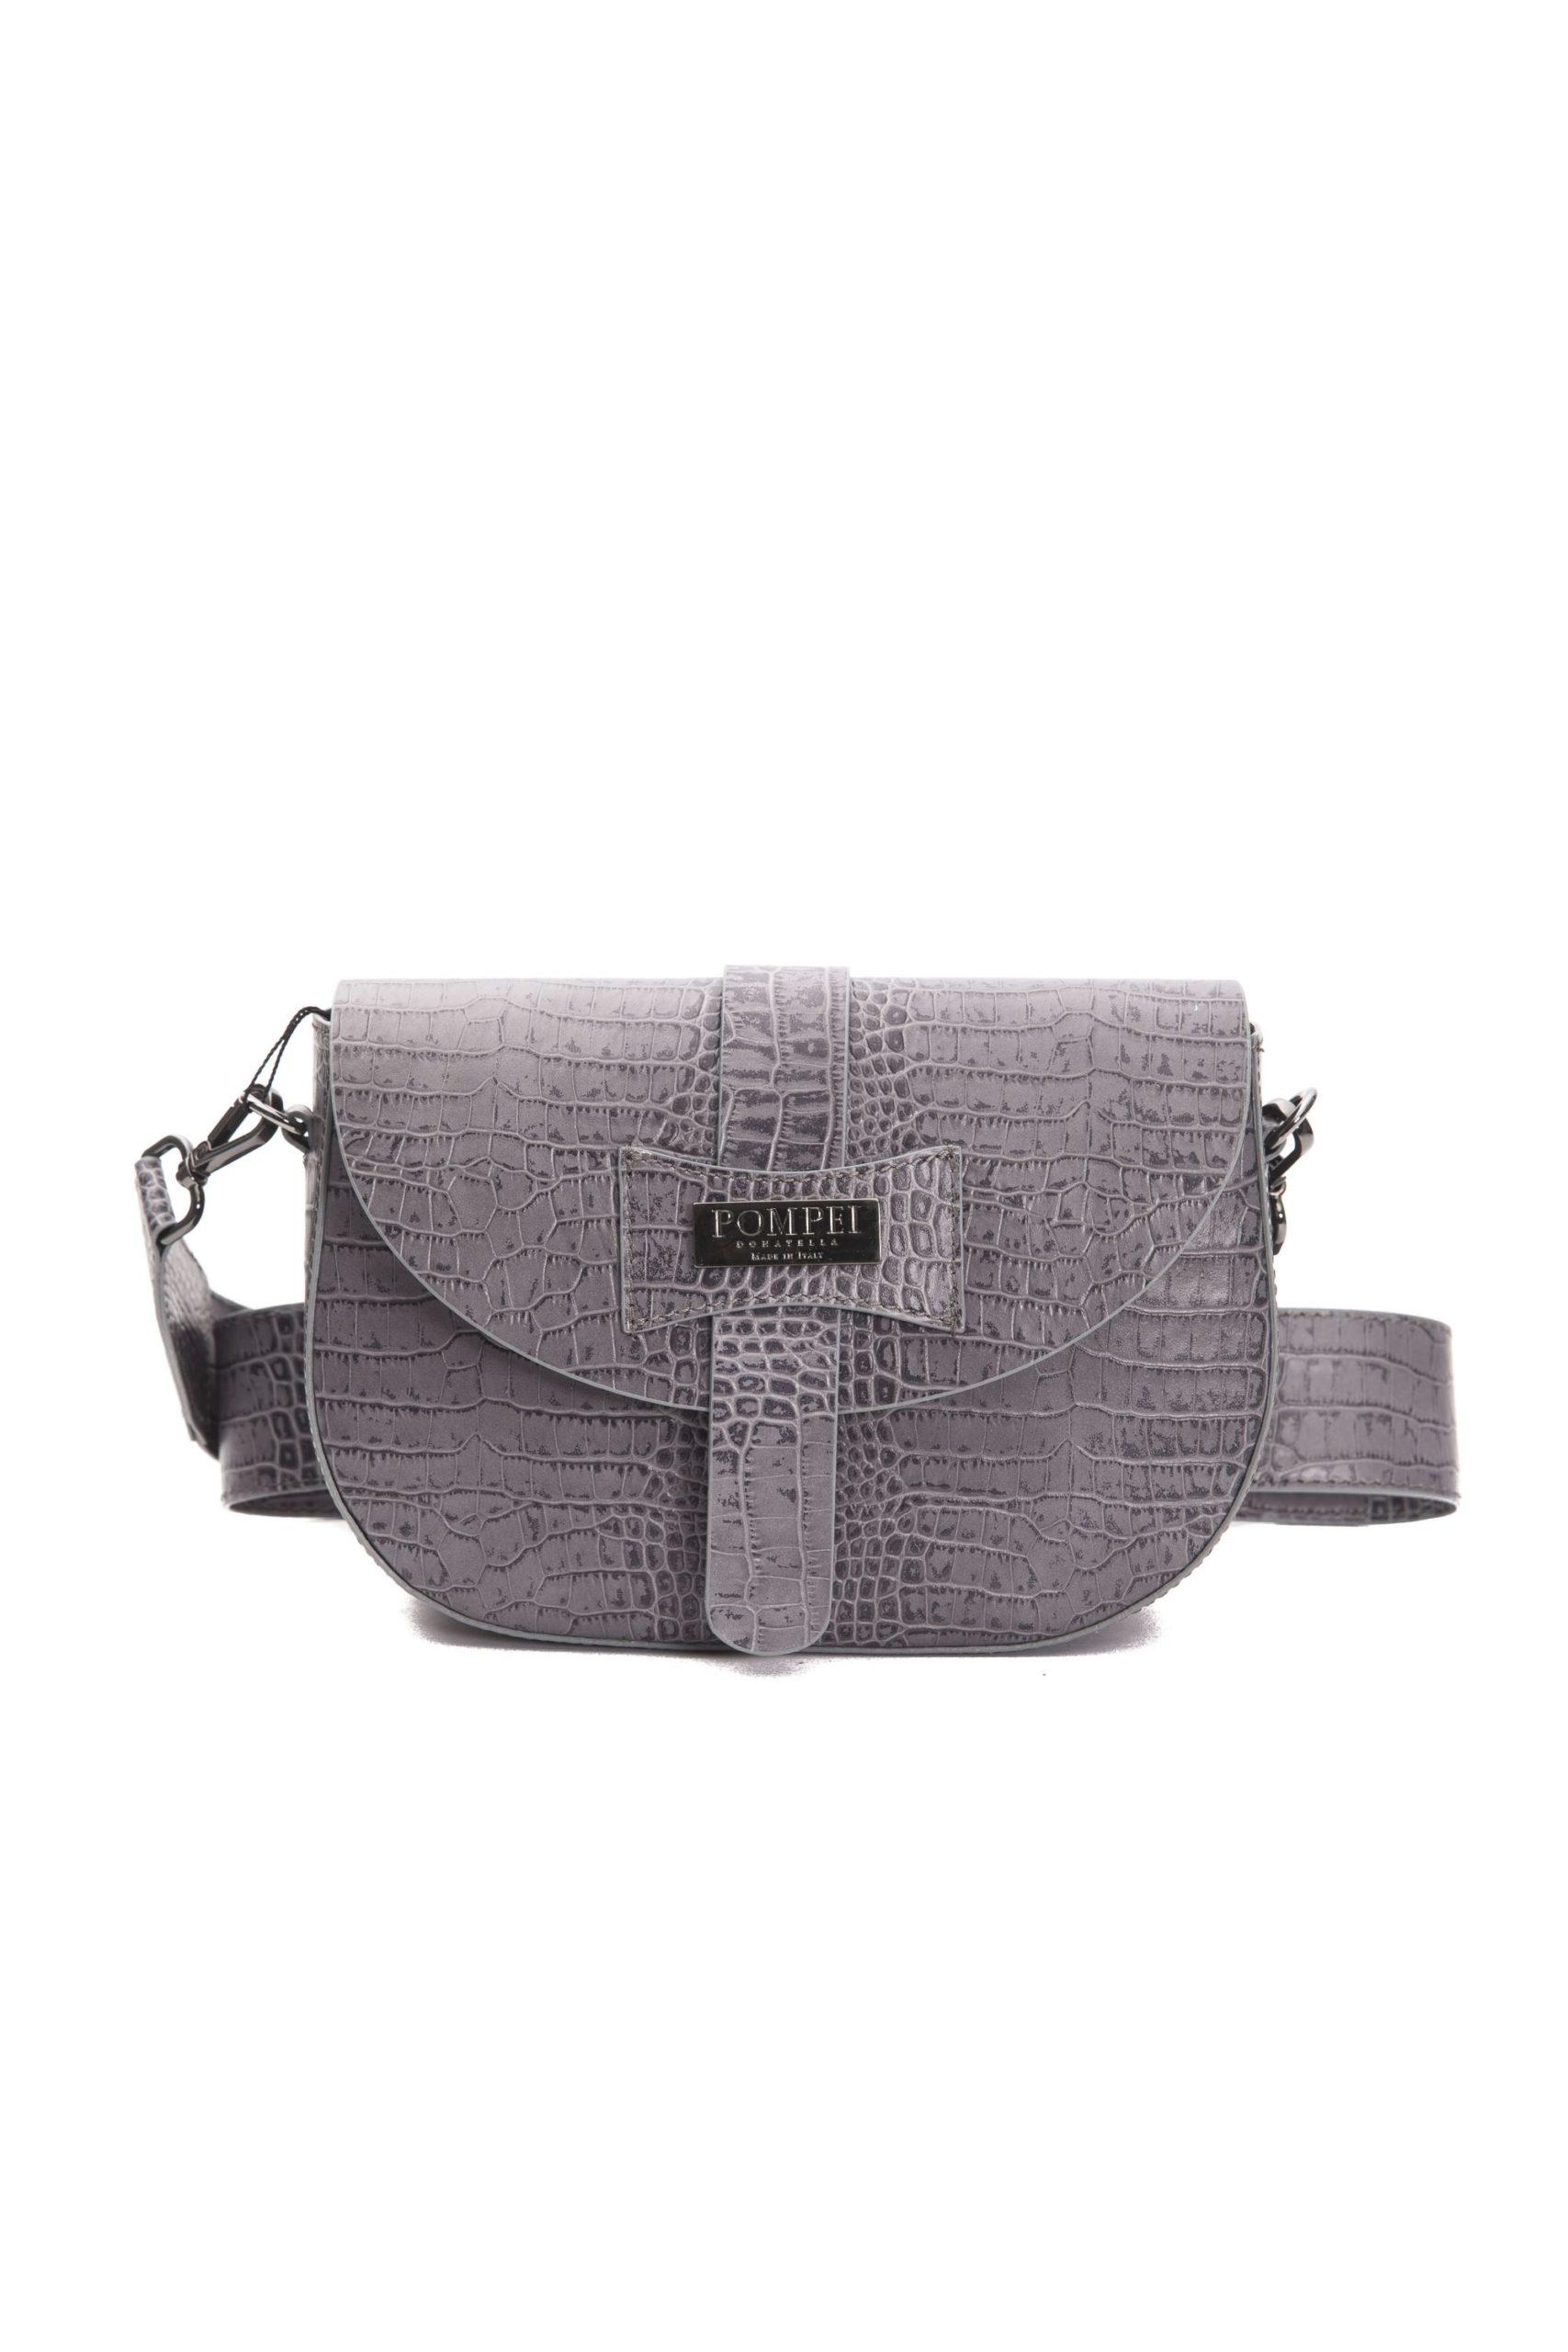 Pompei Donatella Women's Grigio Crossbody Bag Grey PO1004289